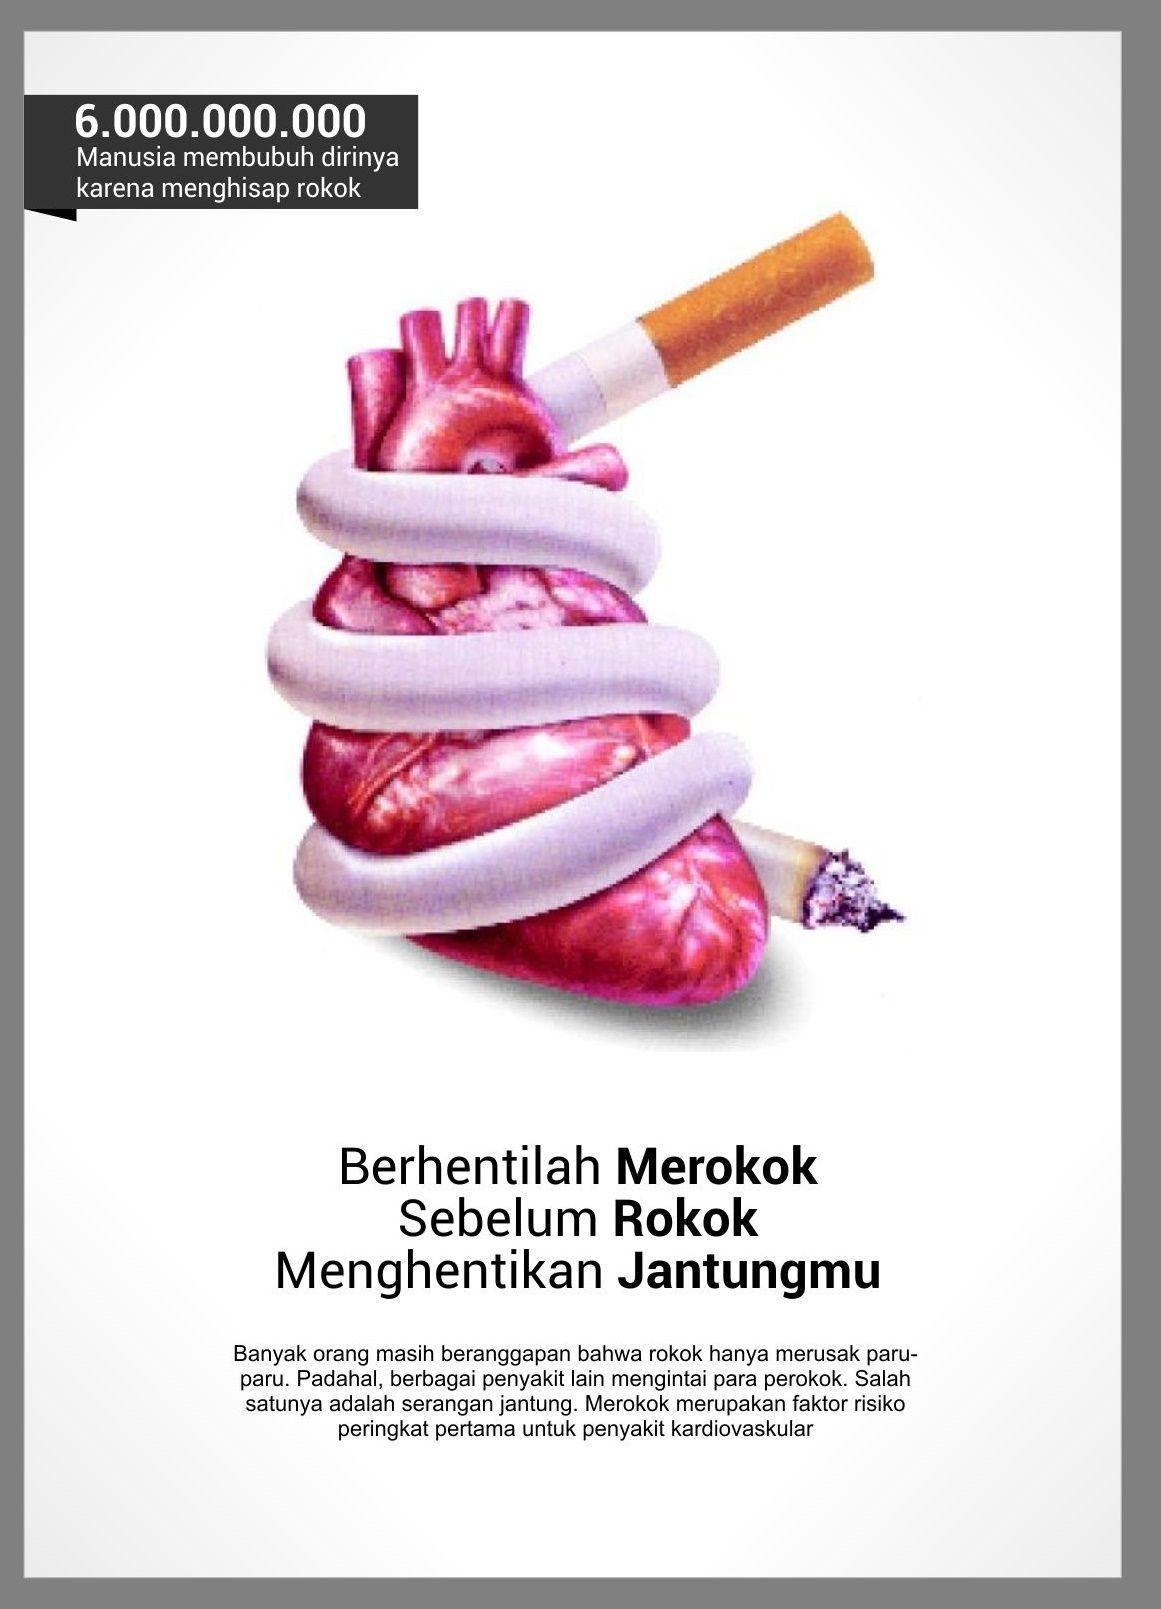 Bahaya Rokok Rokok Kesehatan